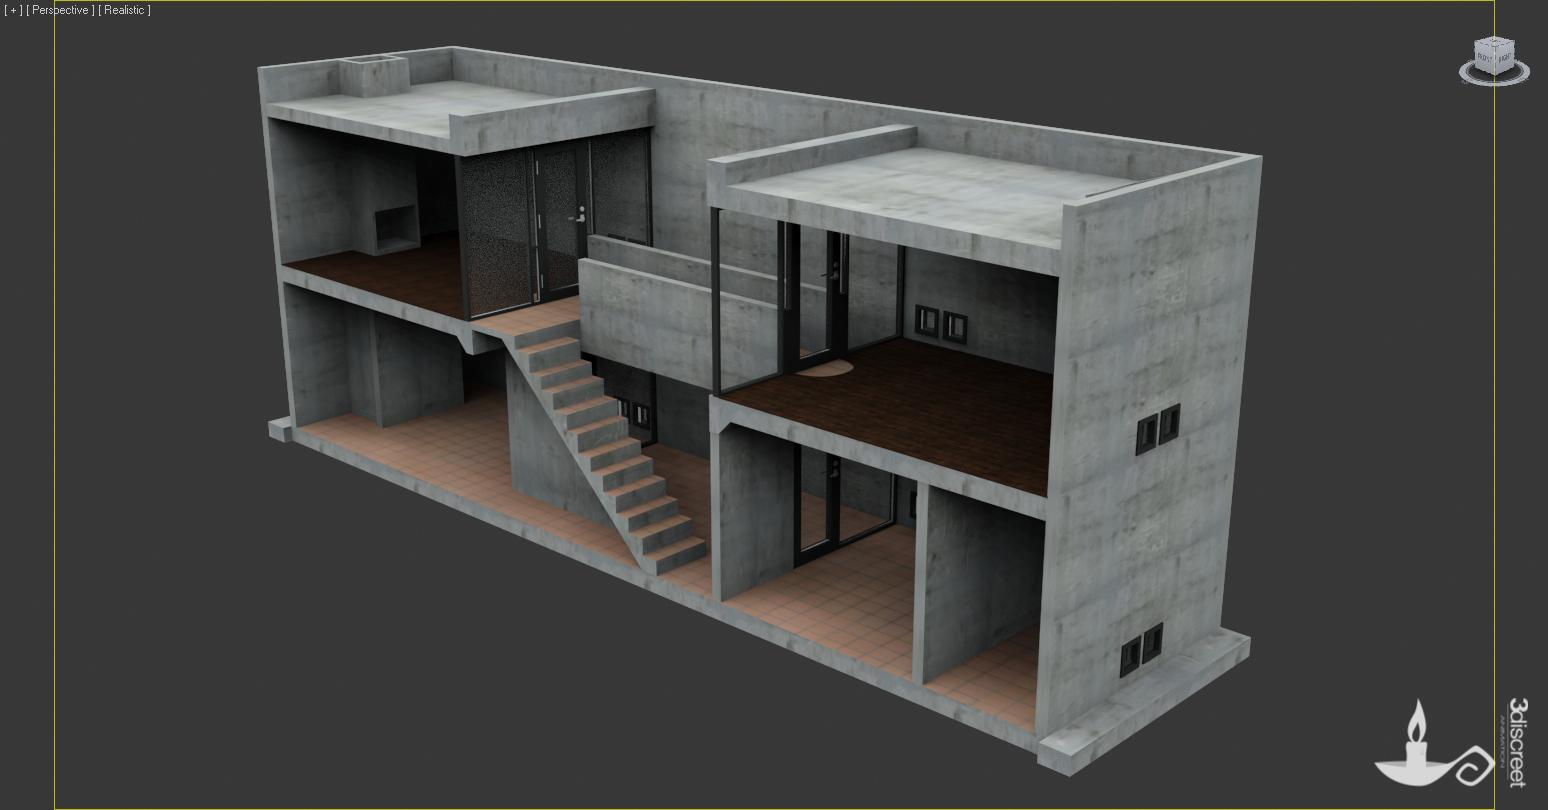 3discreet Tadao Ando S Row House